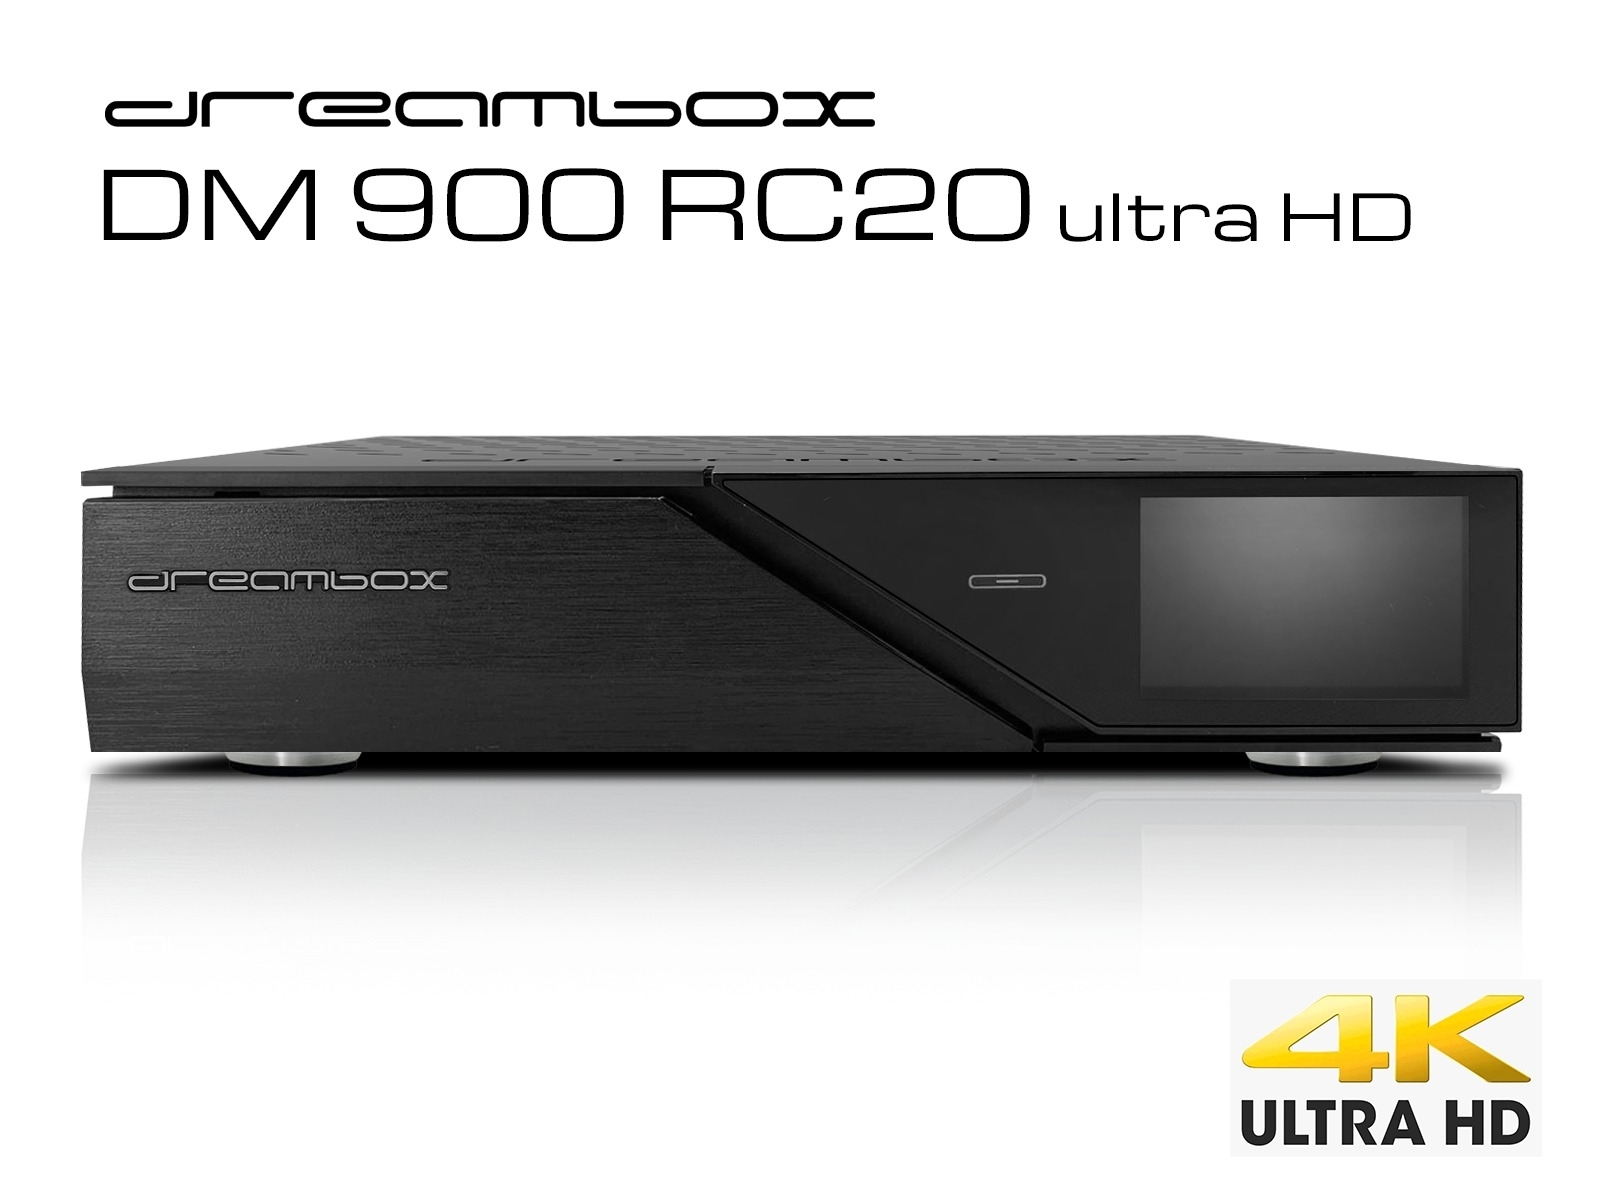 Dreambox DM900 RC20 UHD 4K 1x Dual DVB-S2X MS Tuner E2 Linux PVR ready Receiver